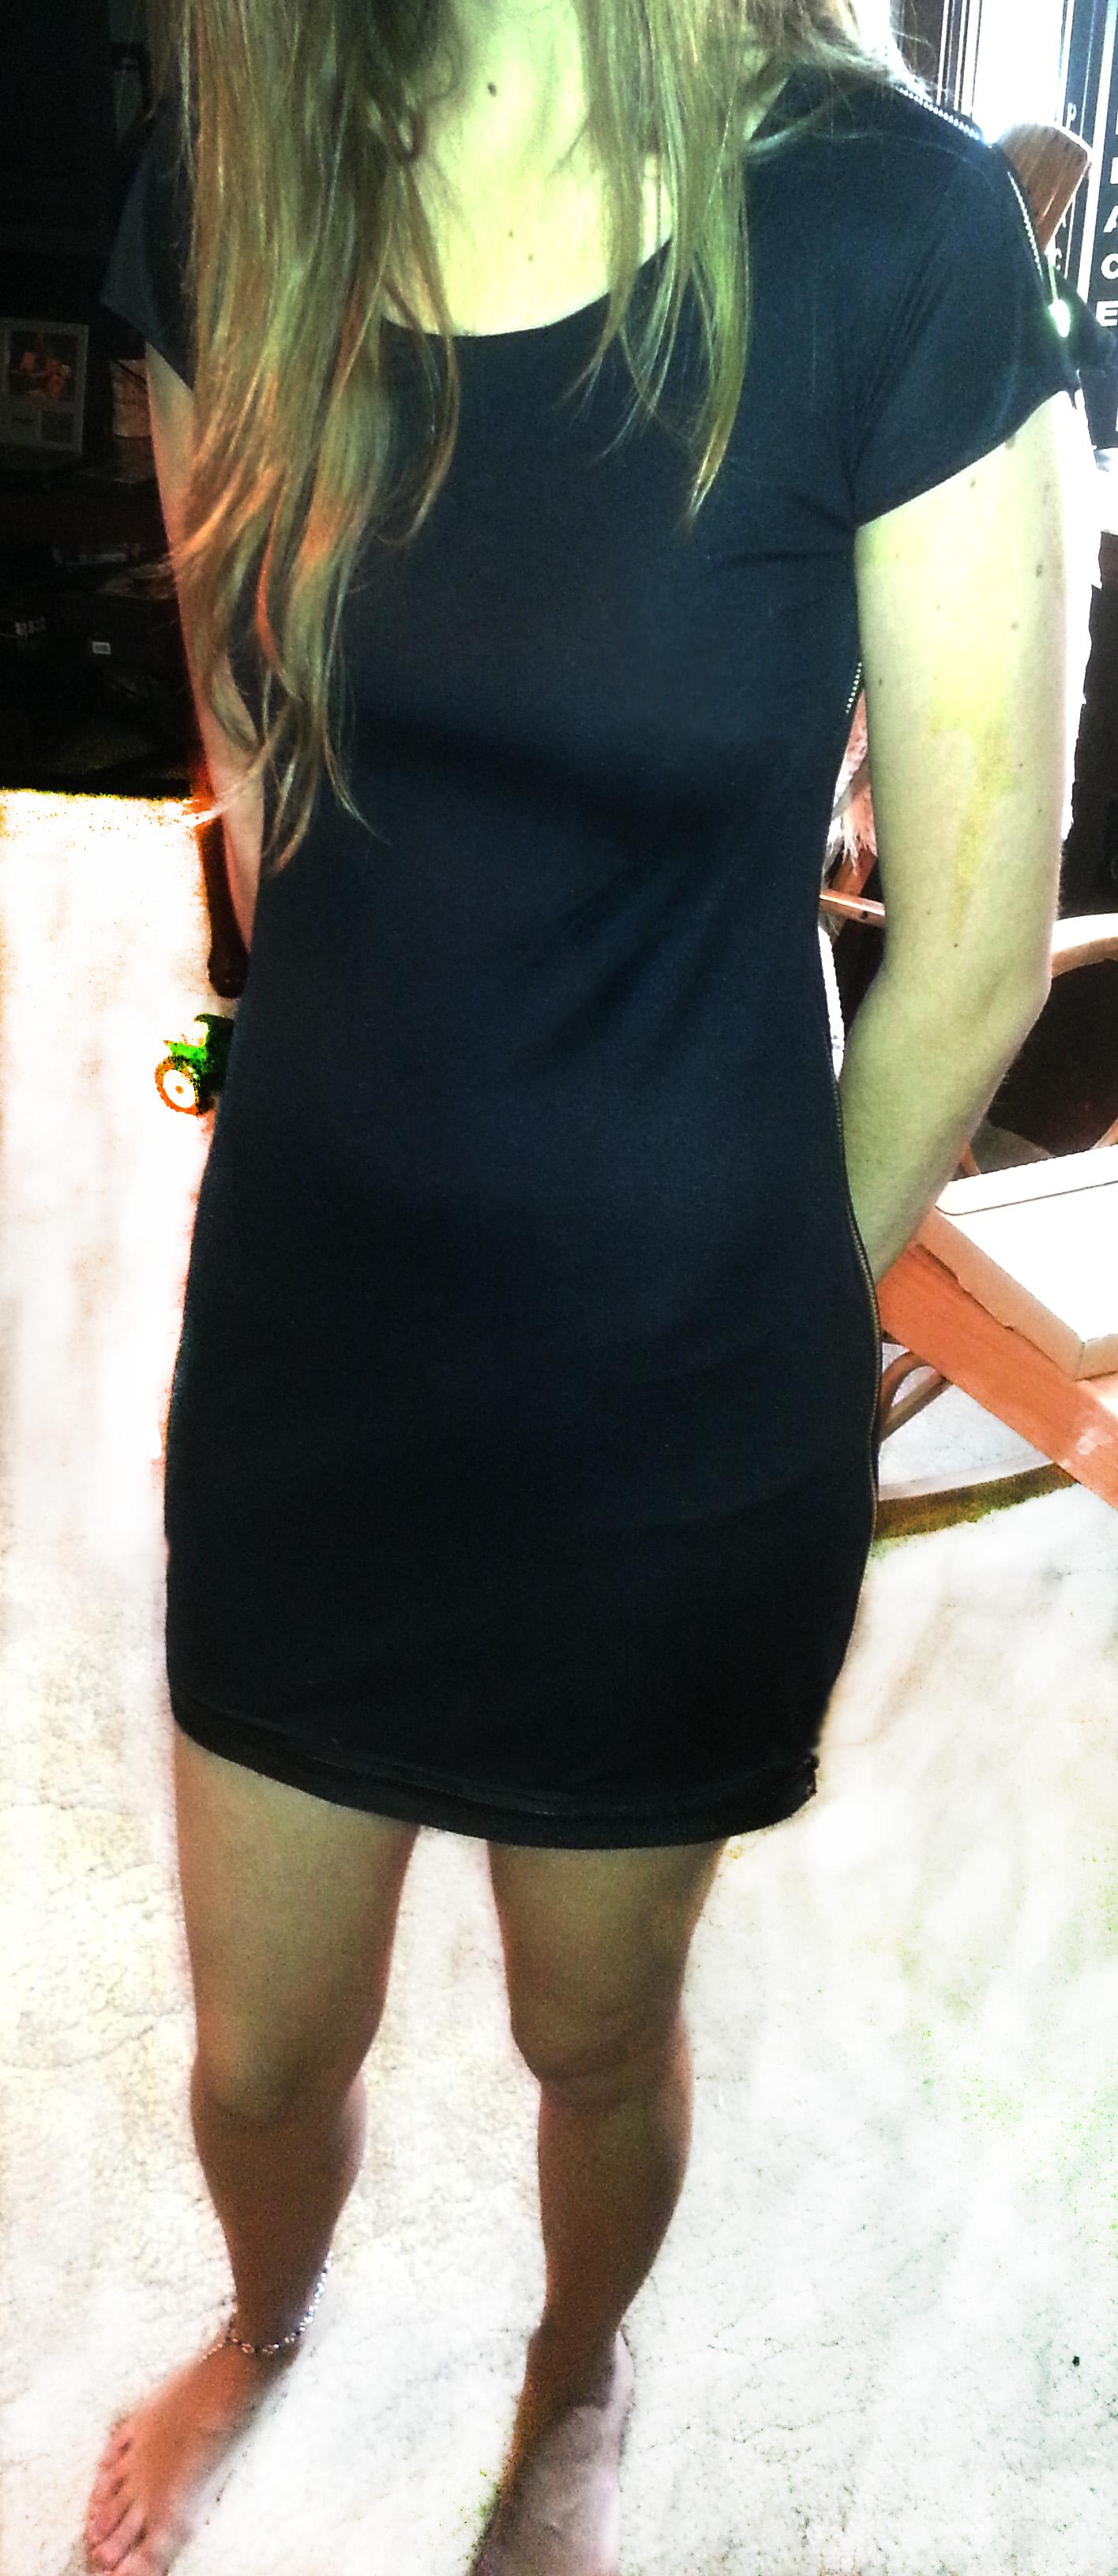 Zipper Seam Dress for the Ladies